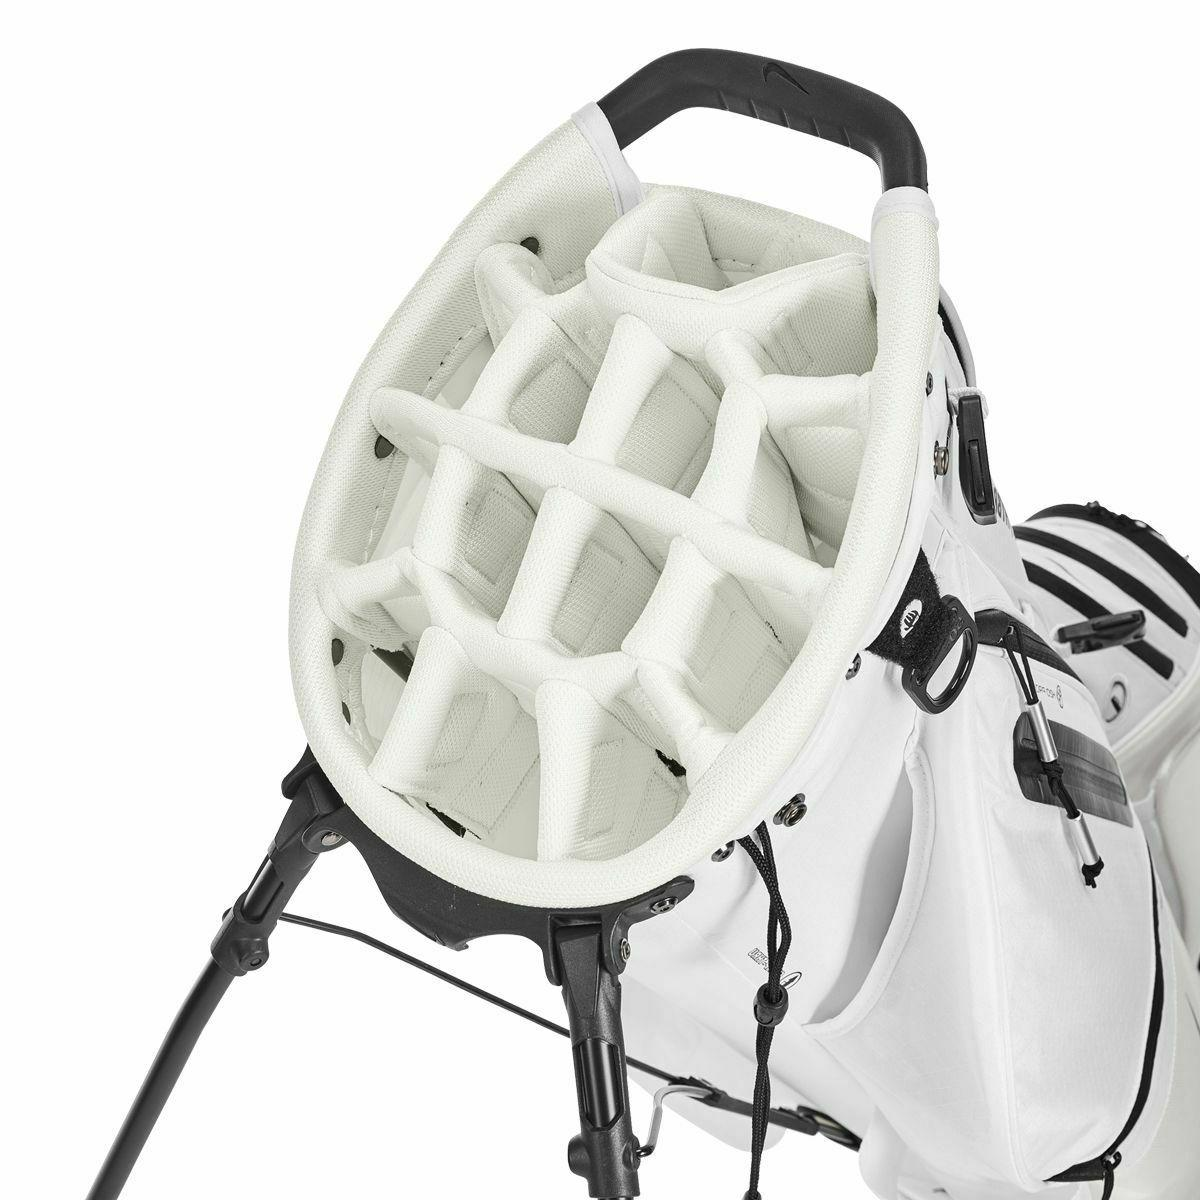 NEW 2020 Nike Air Hybrid Cart Golf Bag White/Black SOLD